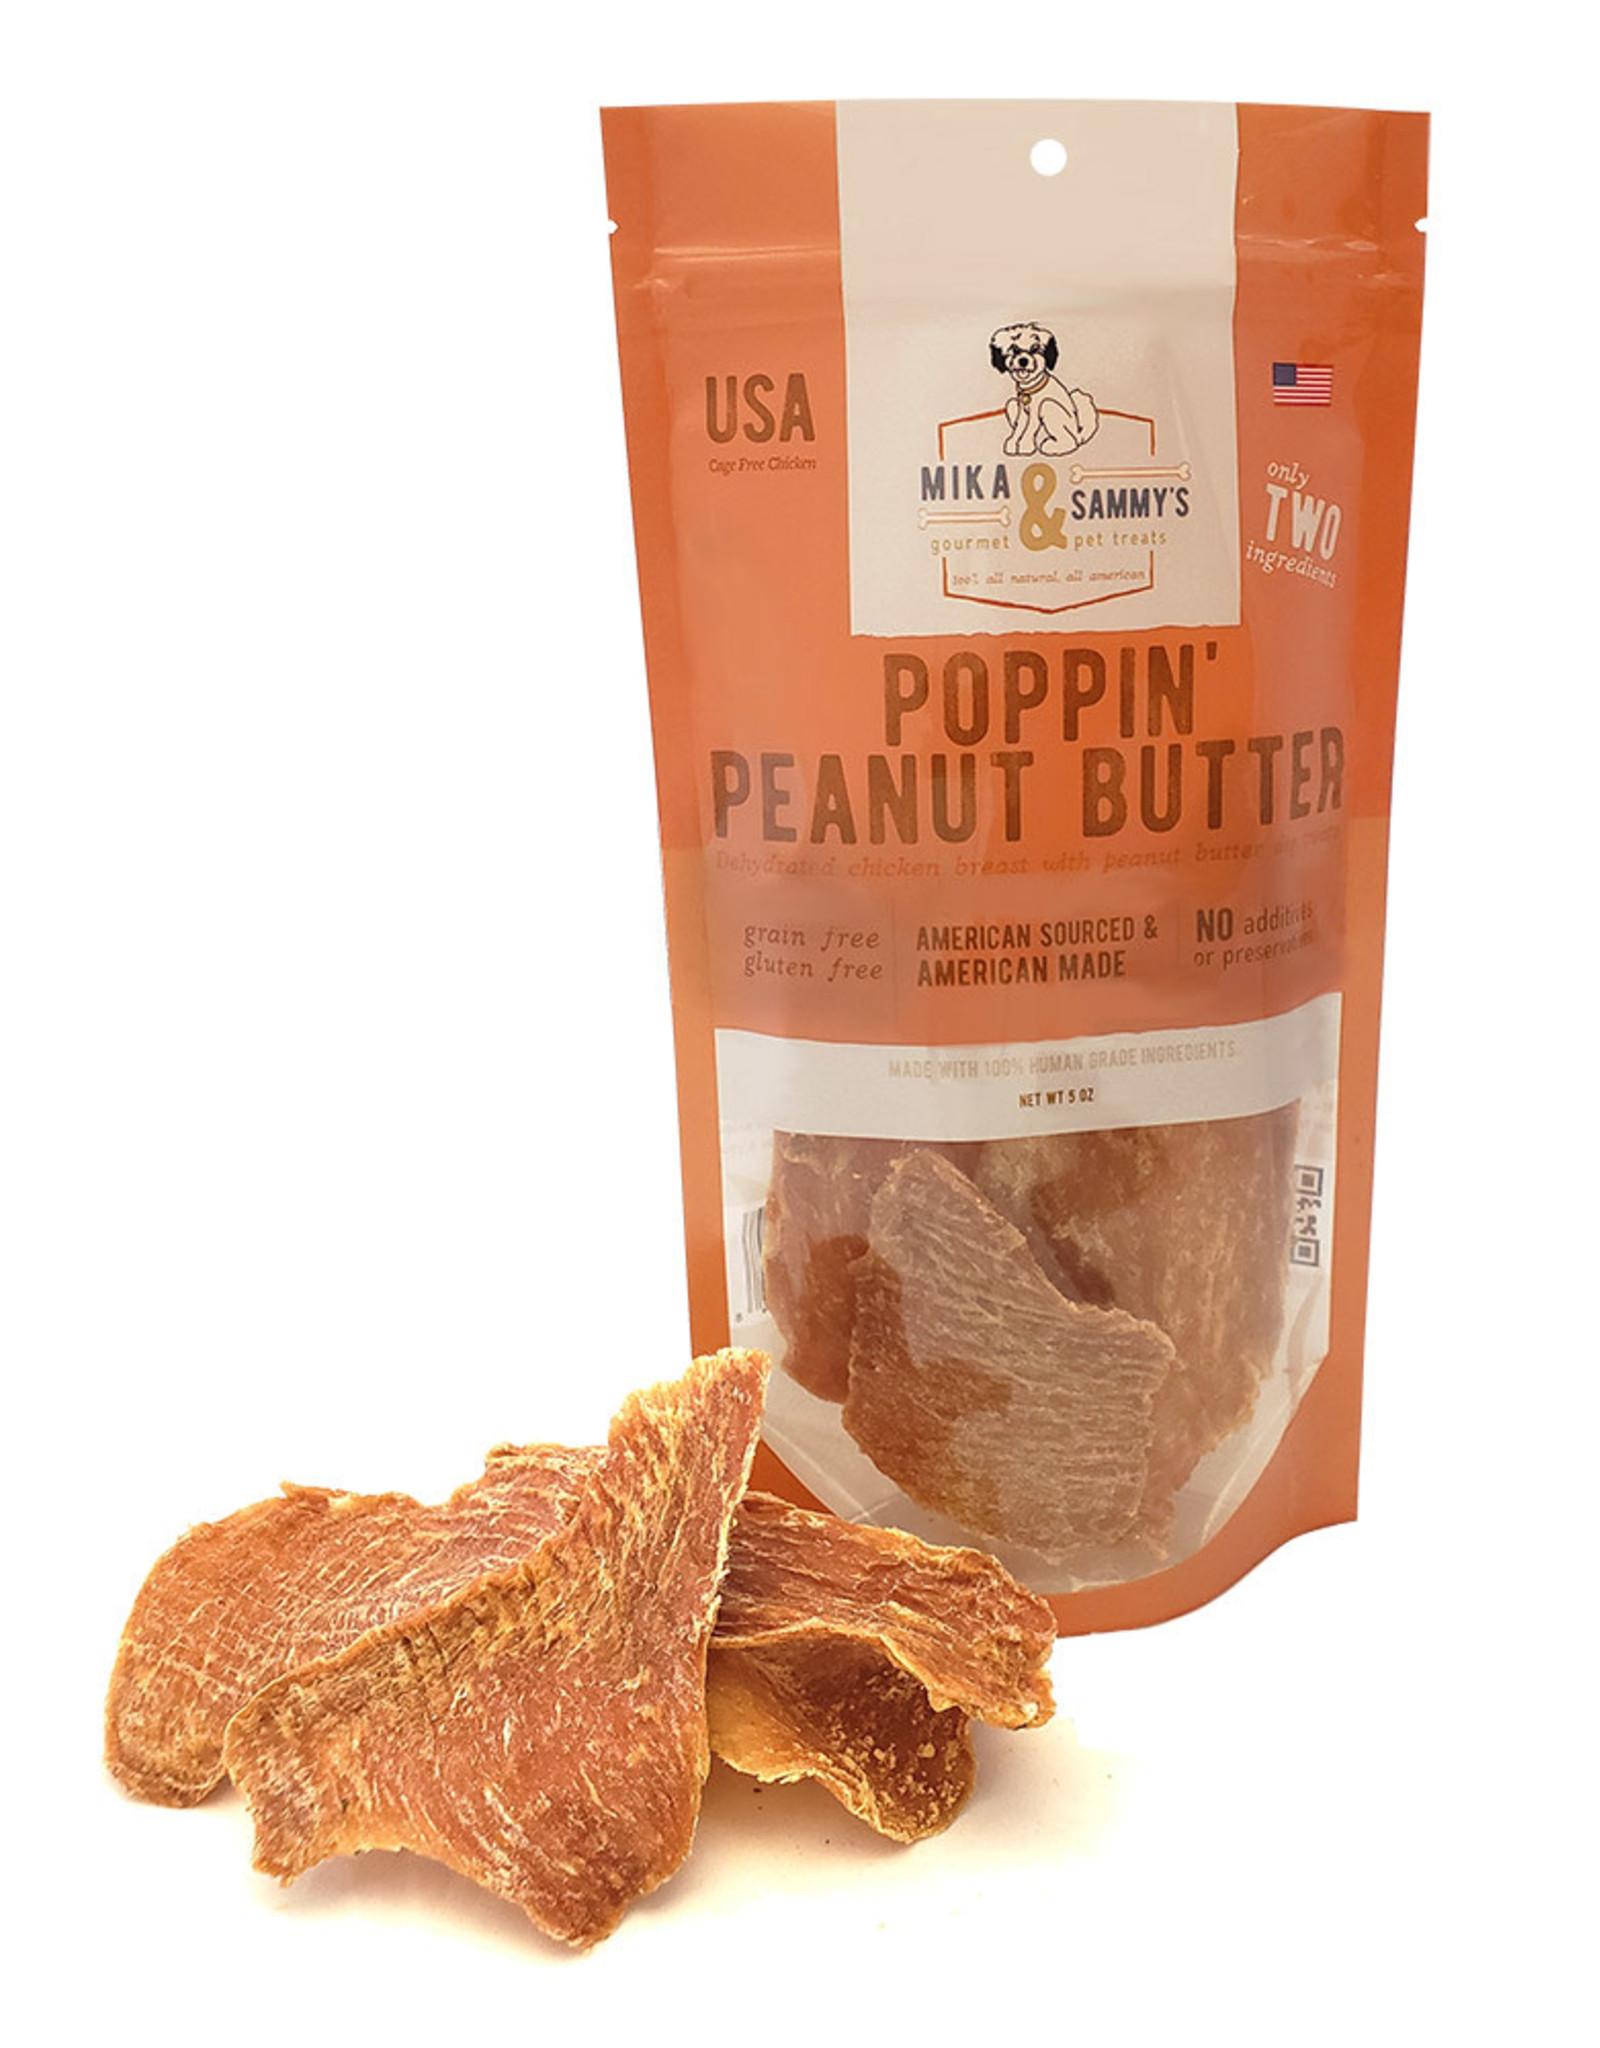 Mika & Sammy's Gourmet Pet Treats Mika & Sammy's: Poppin' Peanut Butter, 5 oz